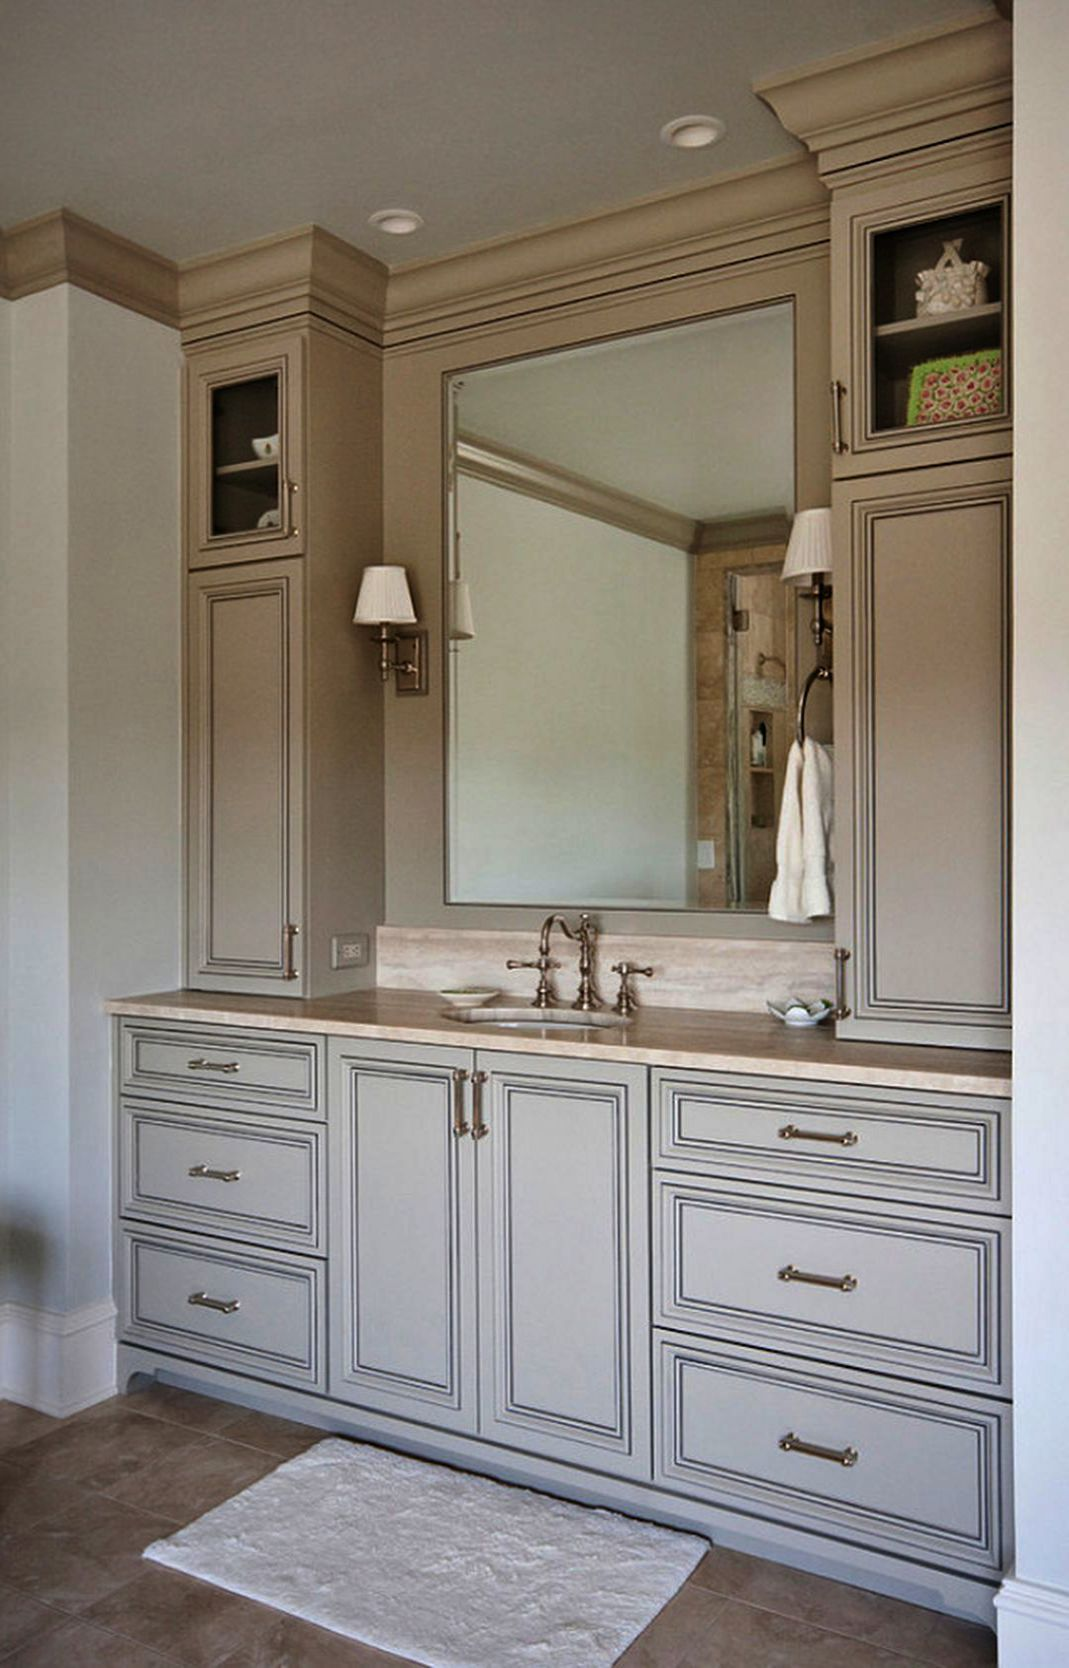 Bathroom Sink Not Draining Around Bathroom Remodel Homewyse Whether Small Bathroom Cabinet Bathroom Vanity Designs Cheap Bathroom Vanities Top Bathroom Design